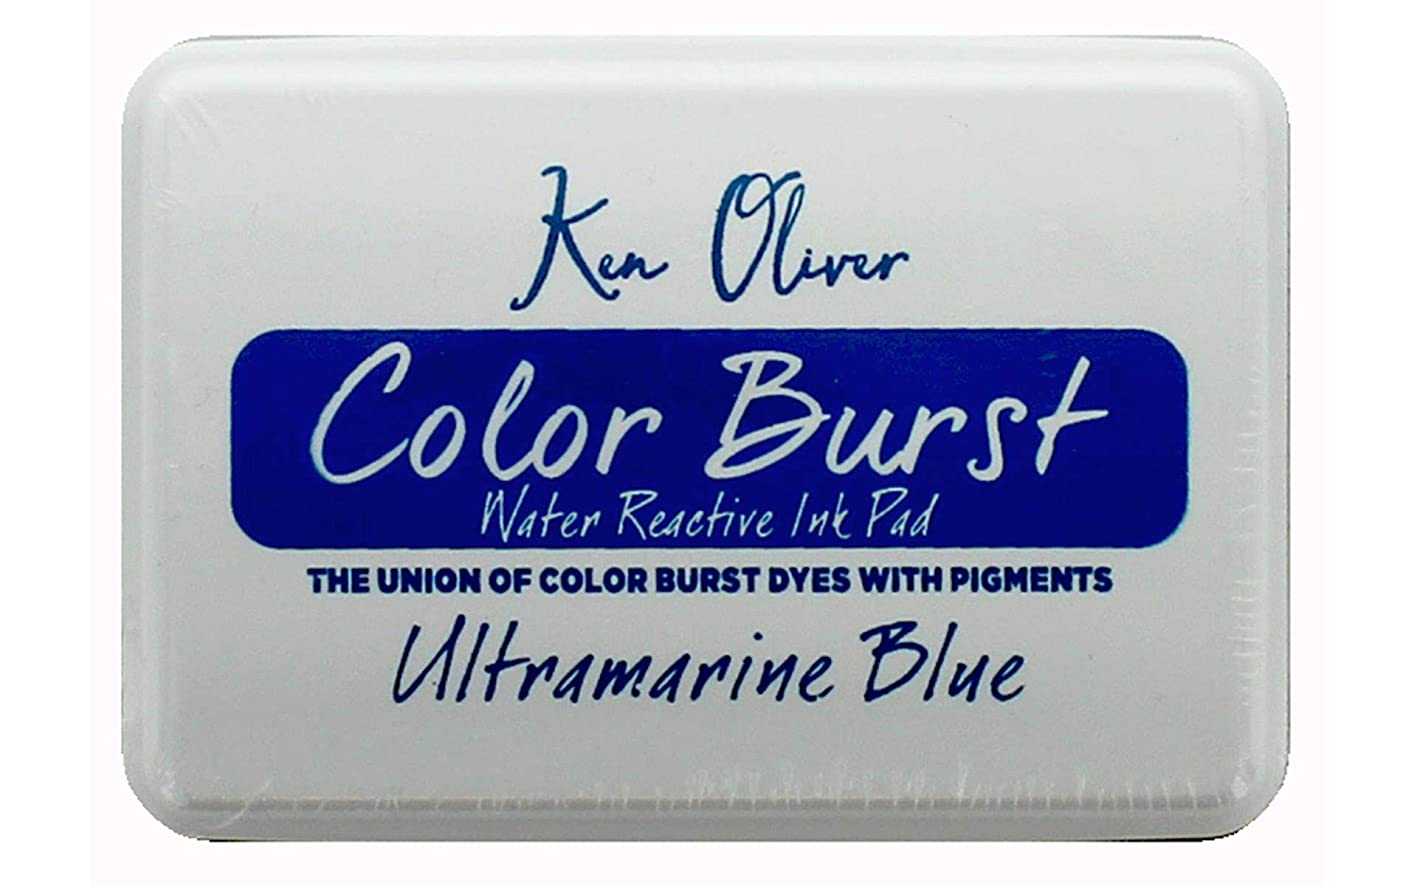 Contact USA KN08732 KO Color Burst Ink Pad UlmBlue kuddpbogbcz772